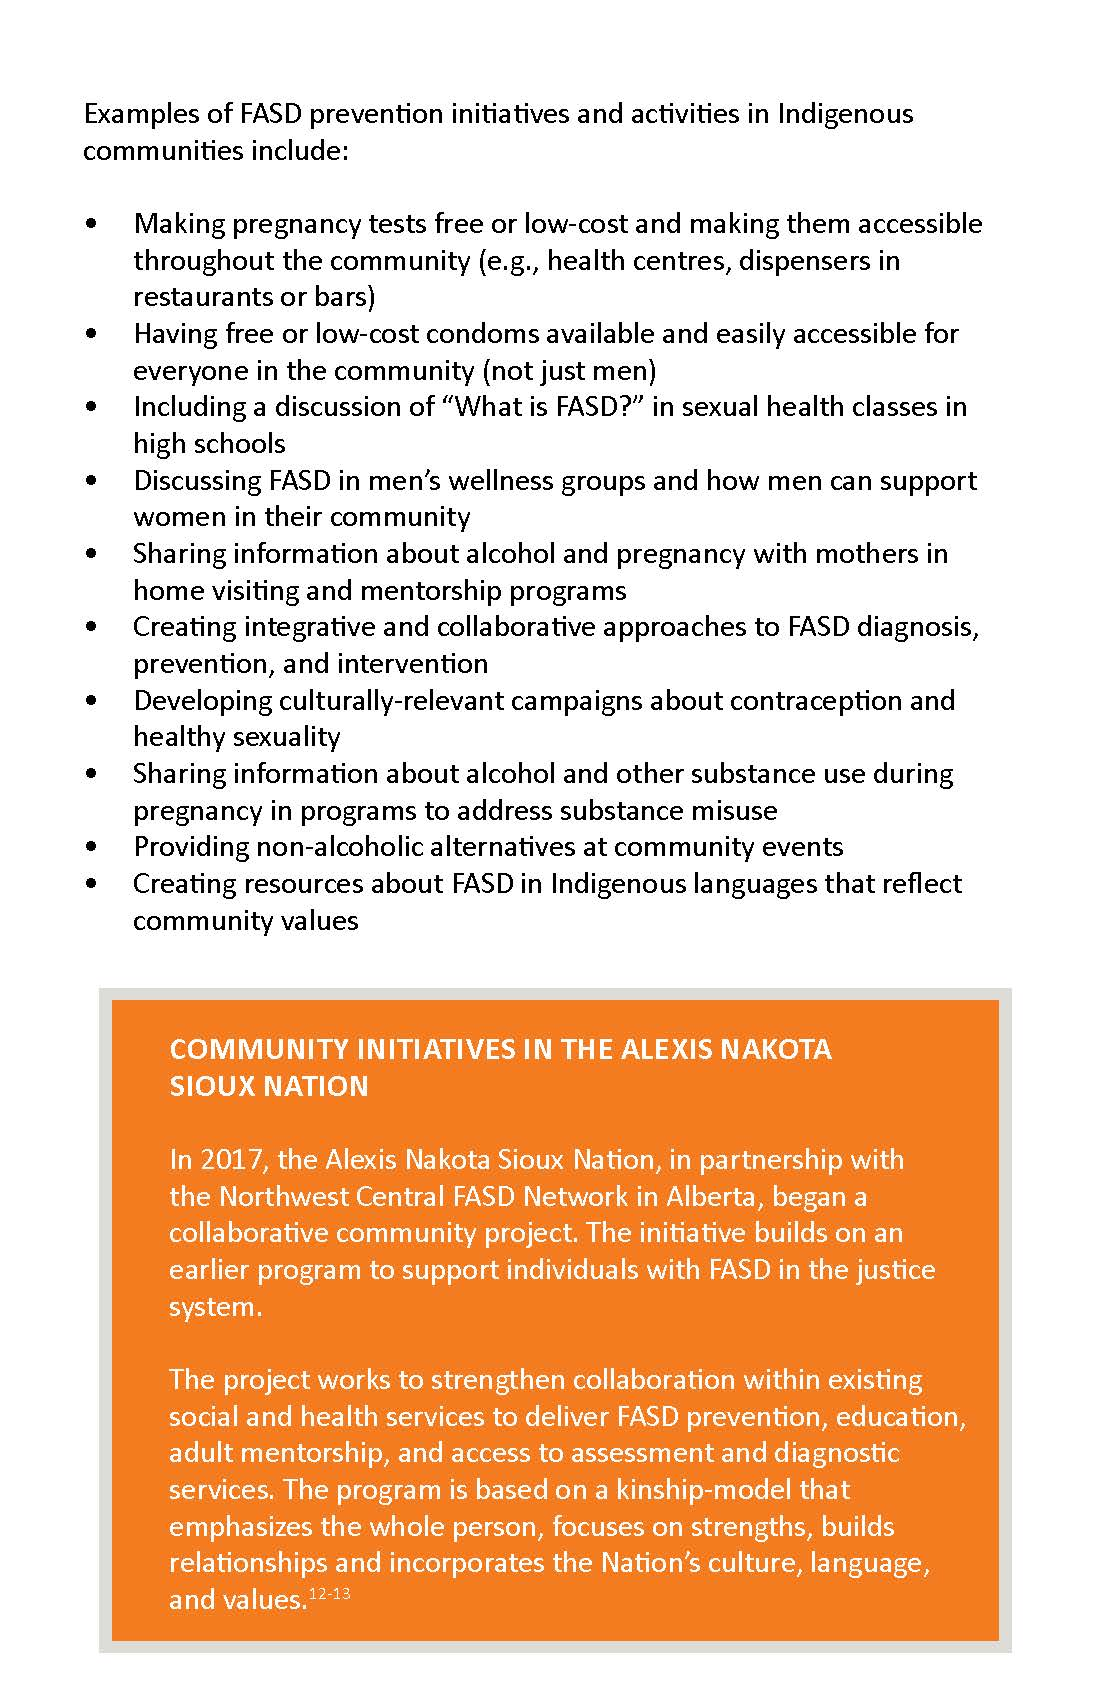 Indig-FASD-COMMUNITY-ACTION_Jan2018_Page_11